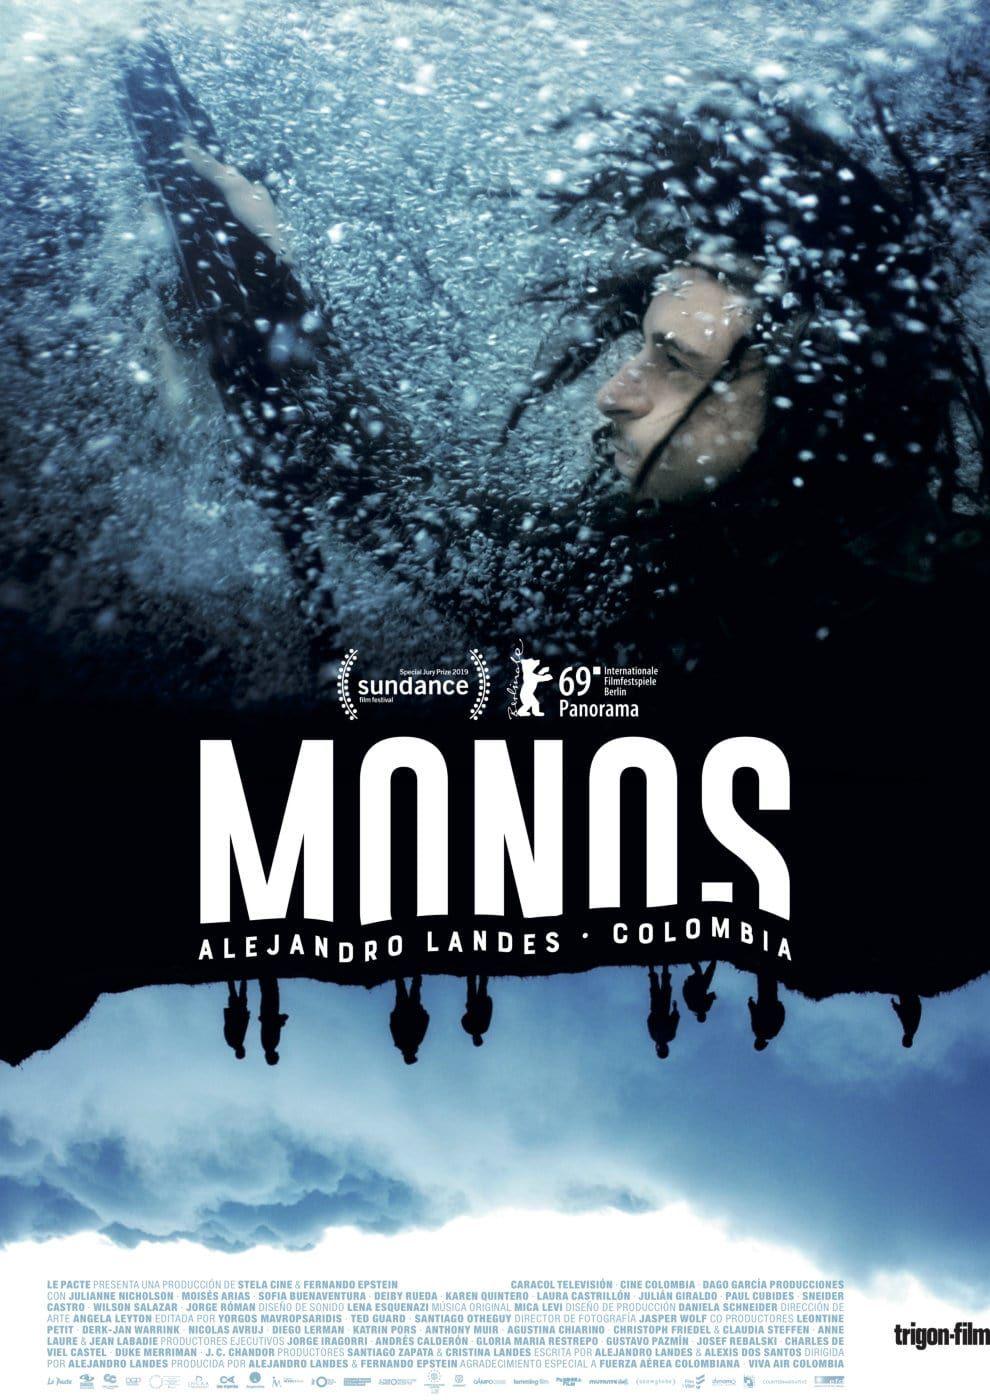 Download Monos Full Movie Sub 2019 Mon Full Movies Full Movies Online Free Free Movies Online